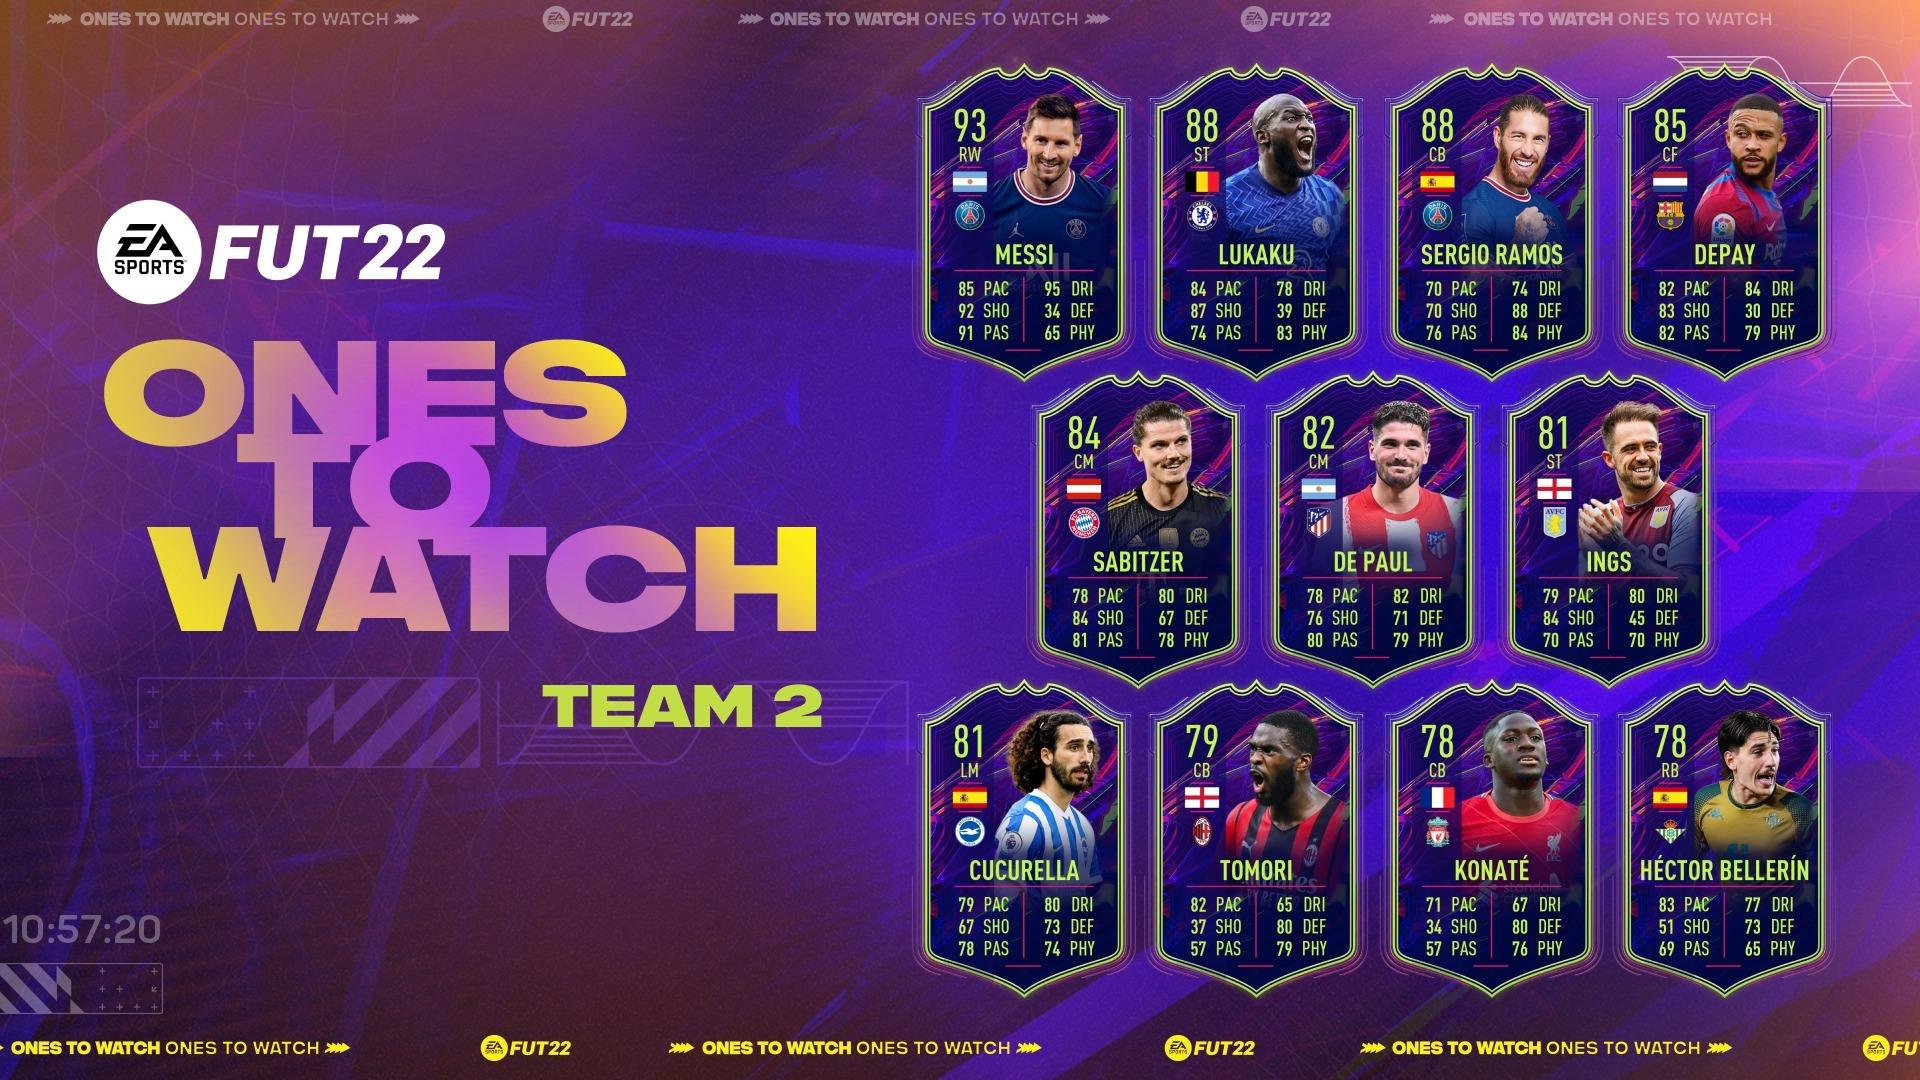 Druga drużyna OTW FIFA 22